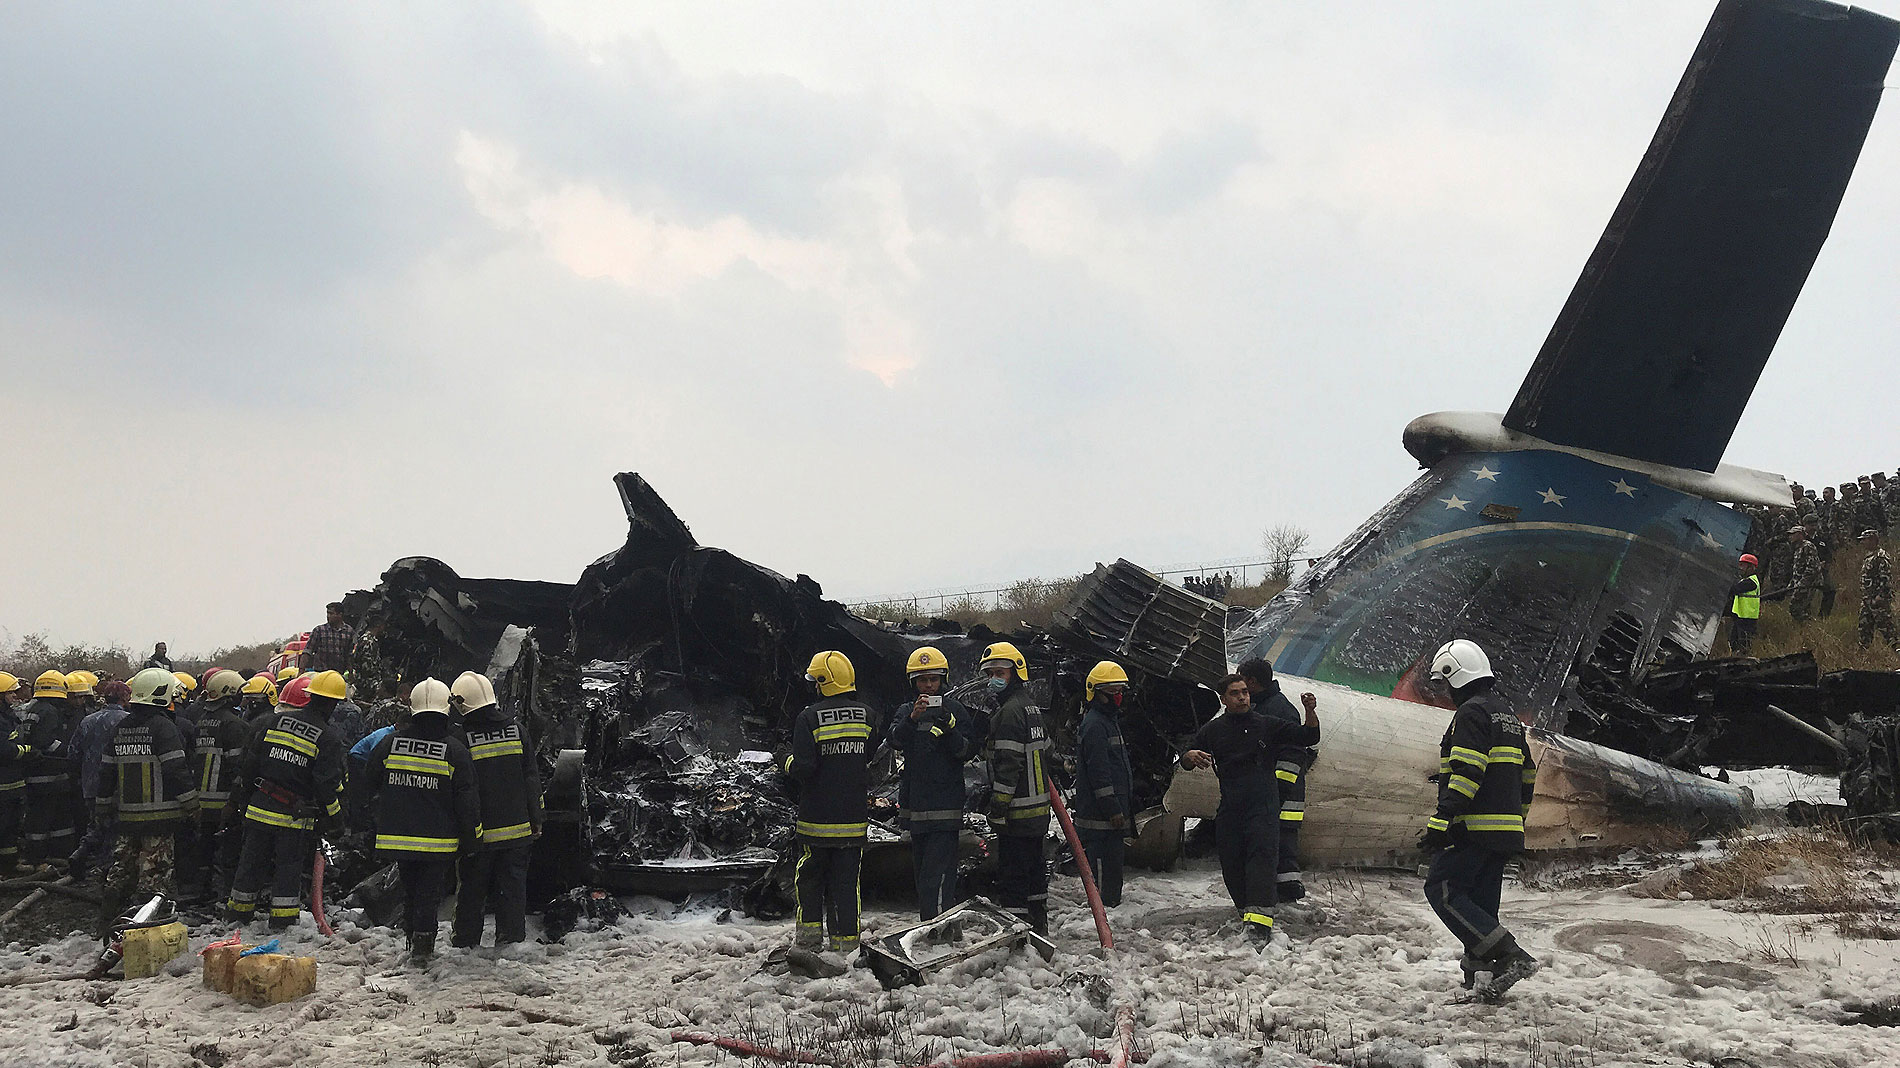 Un avión con 71 personas a bordo se estrella en Katmandú